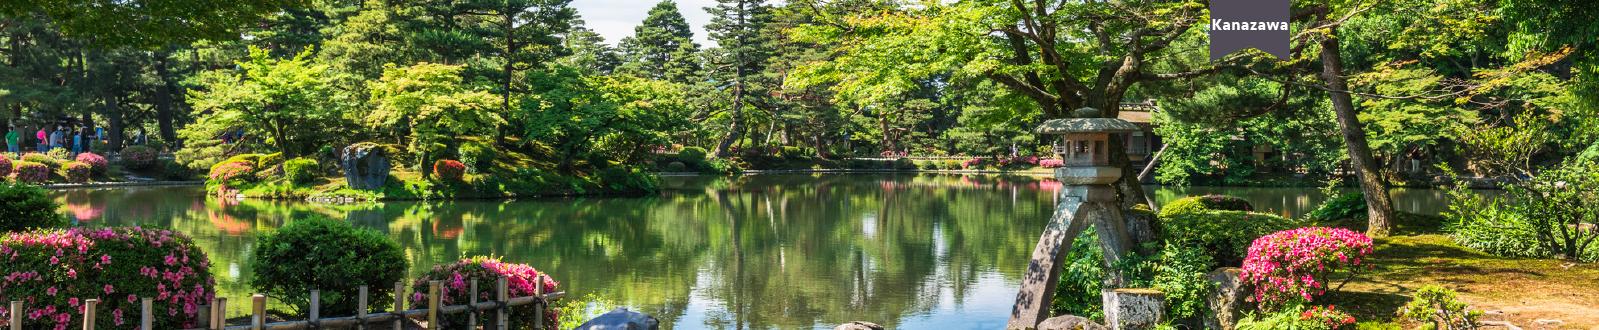 Kanazawa Travel Tips - Local Hostel Staff Recommendations